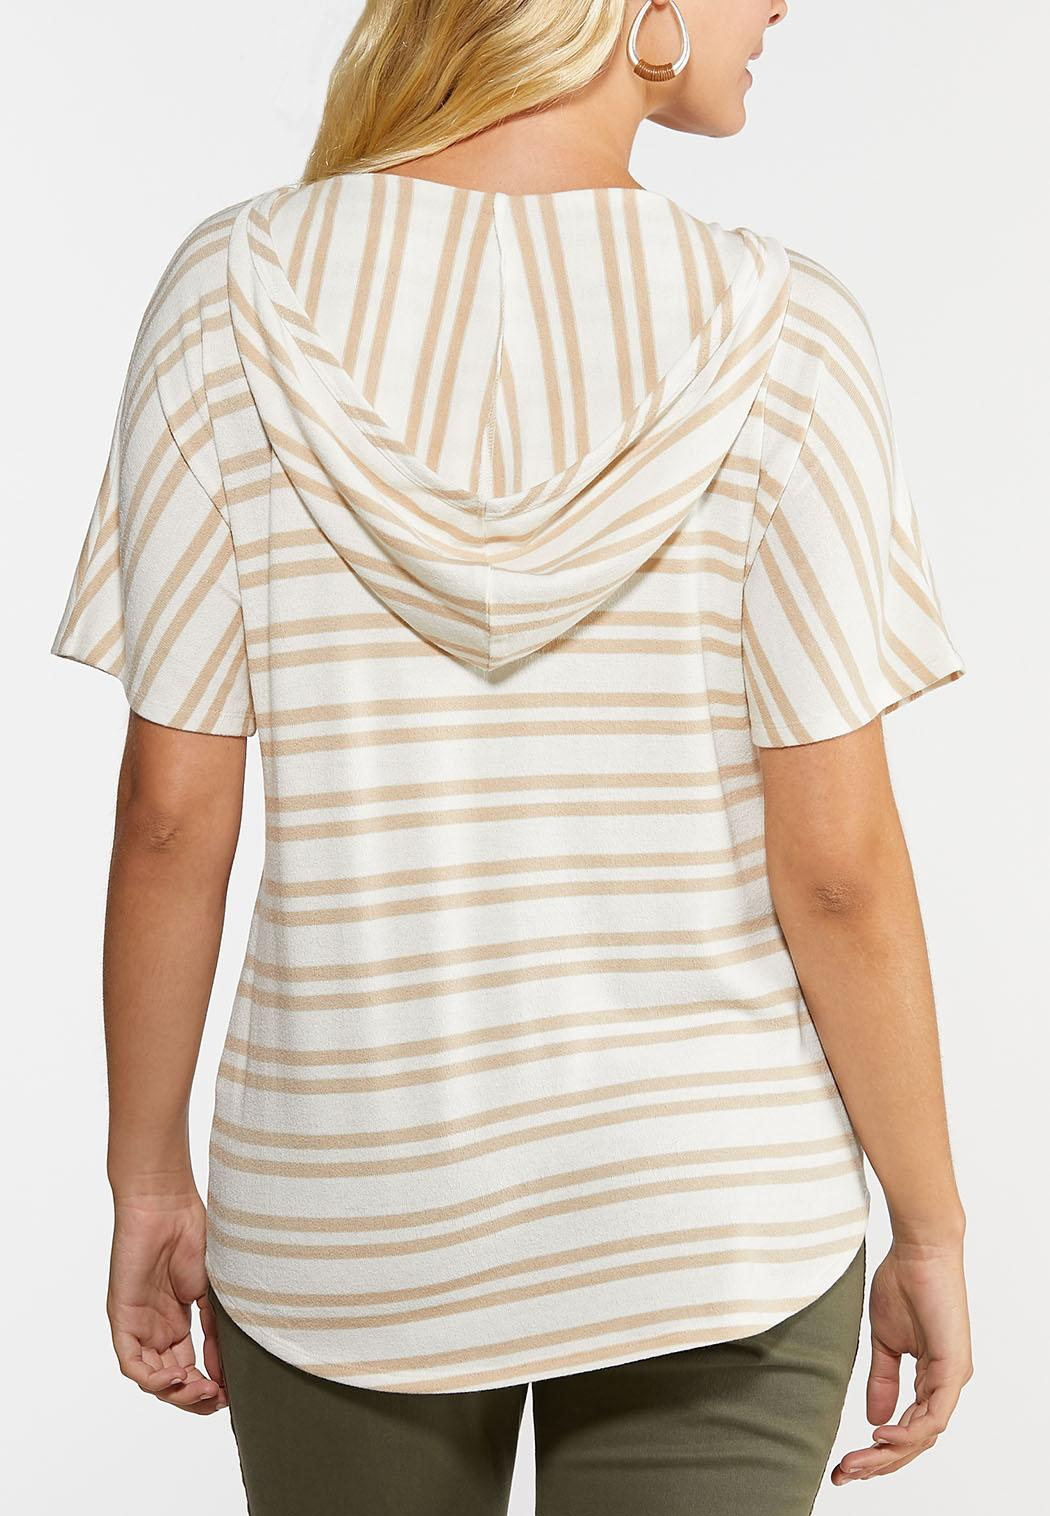 Stripe Tie Front Hooded Top (Item #44328338)